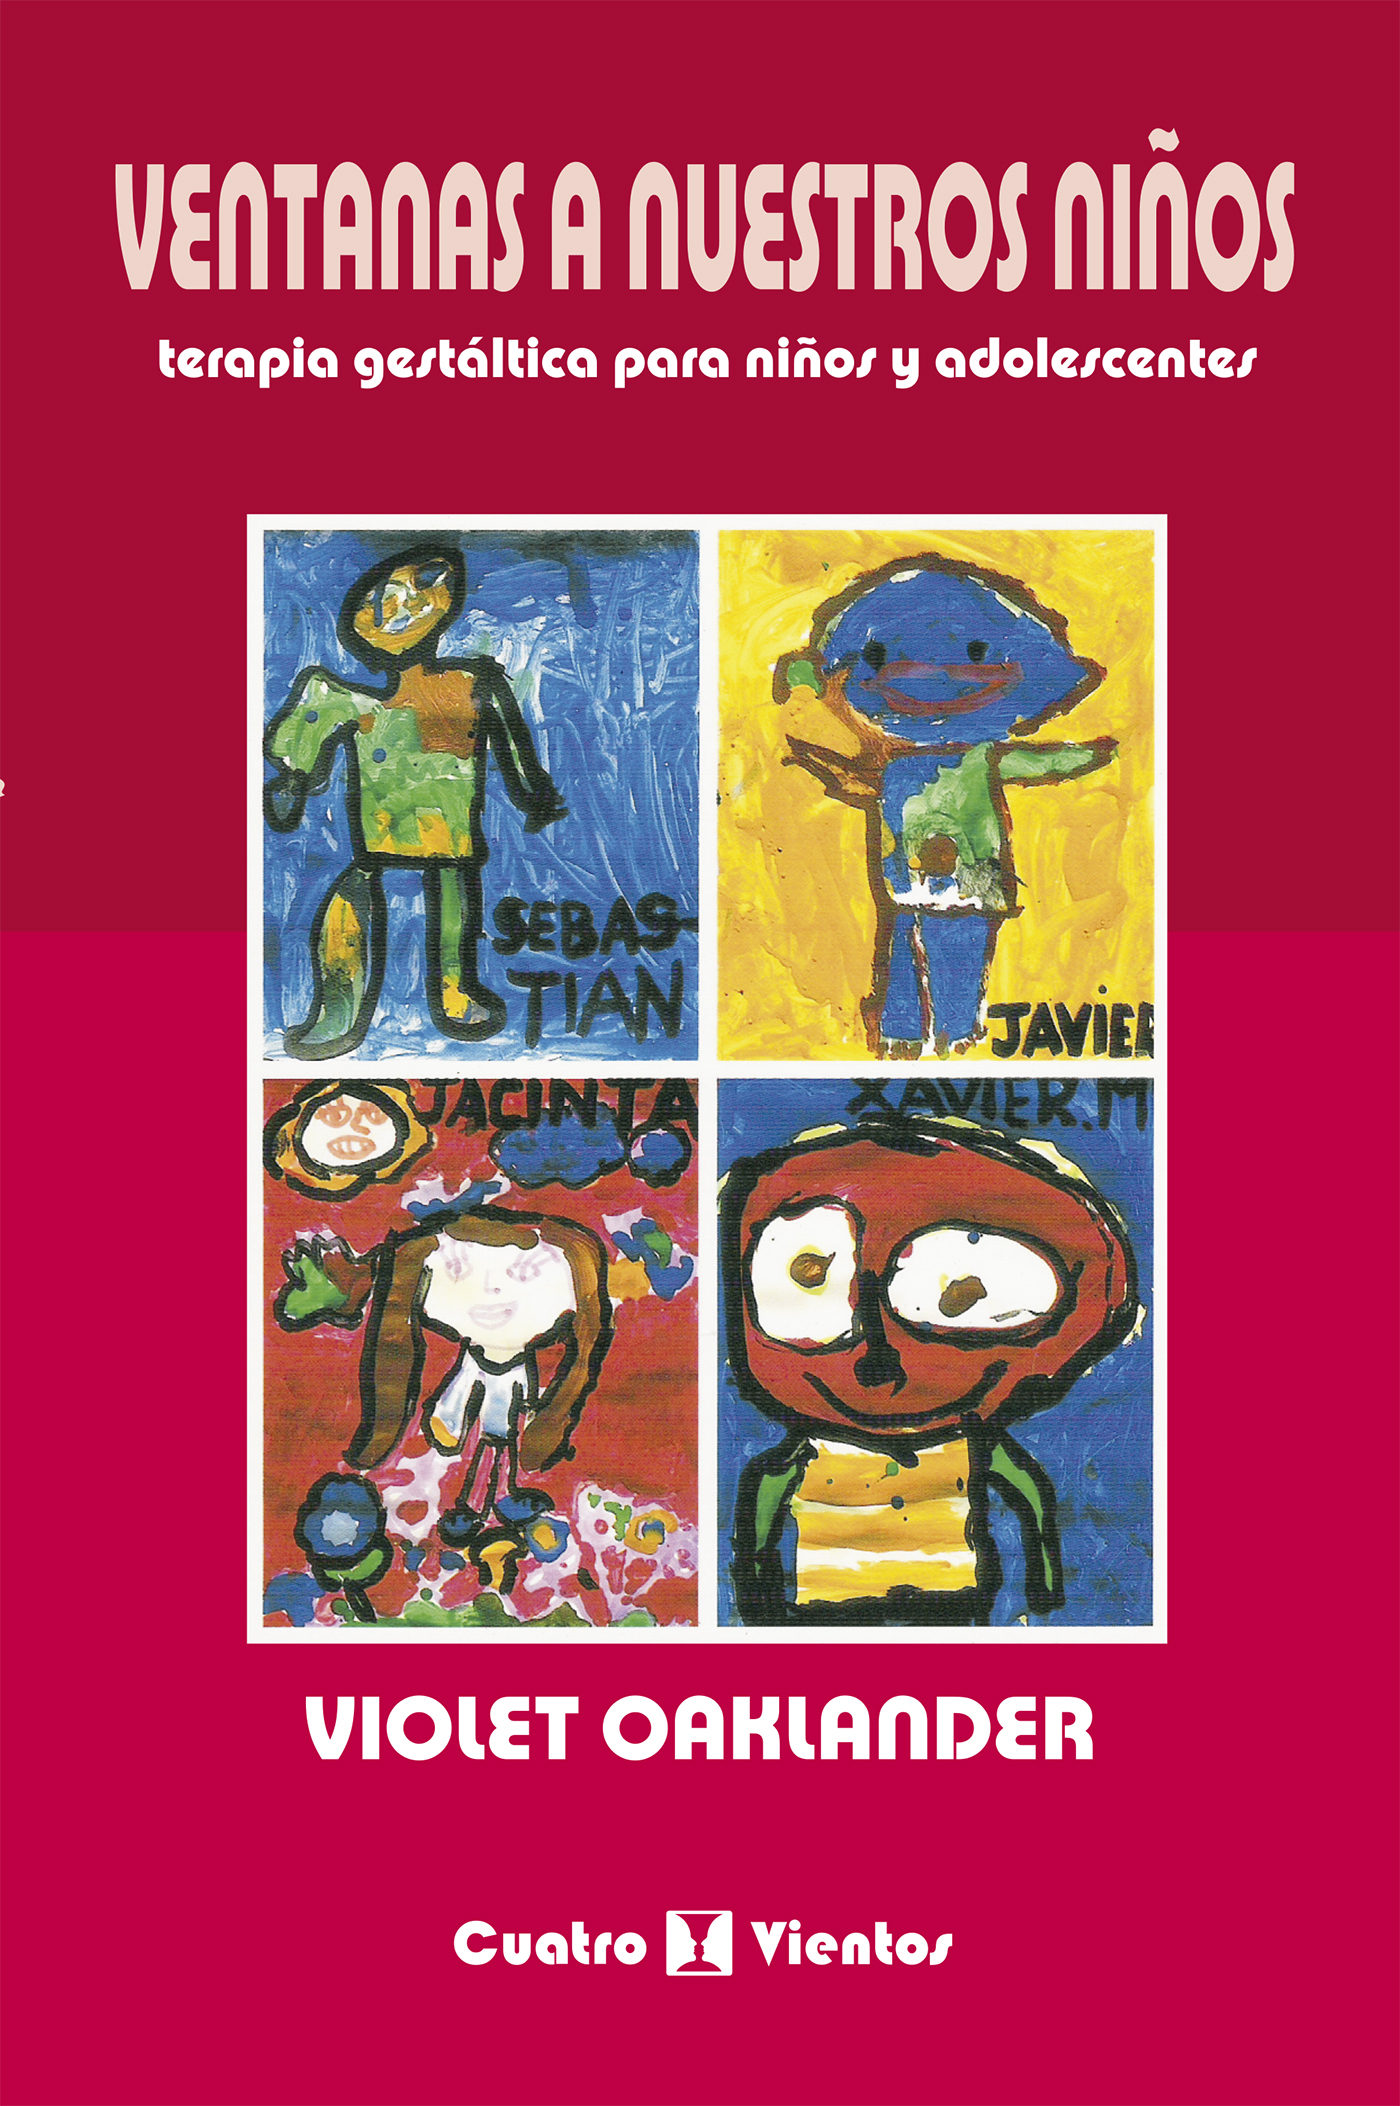 libros infantiles ventanas